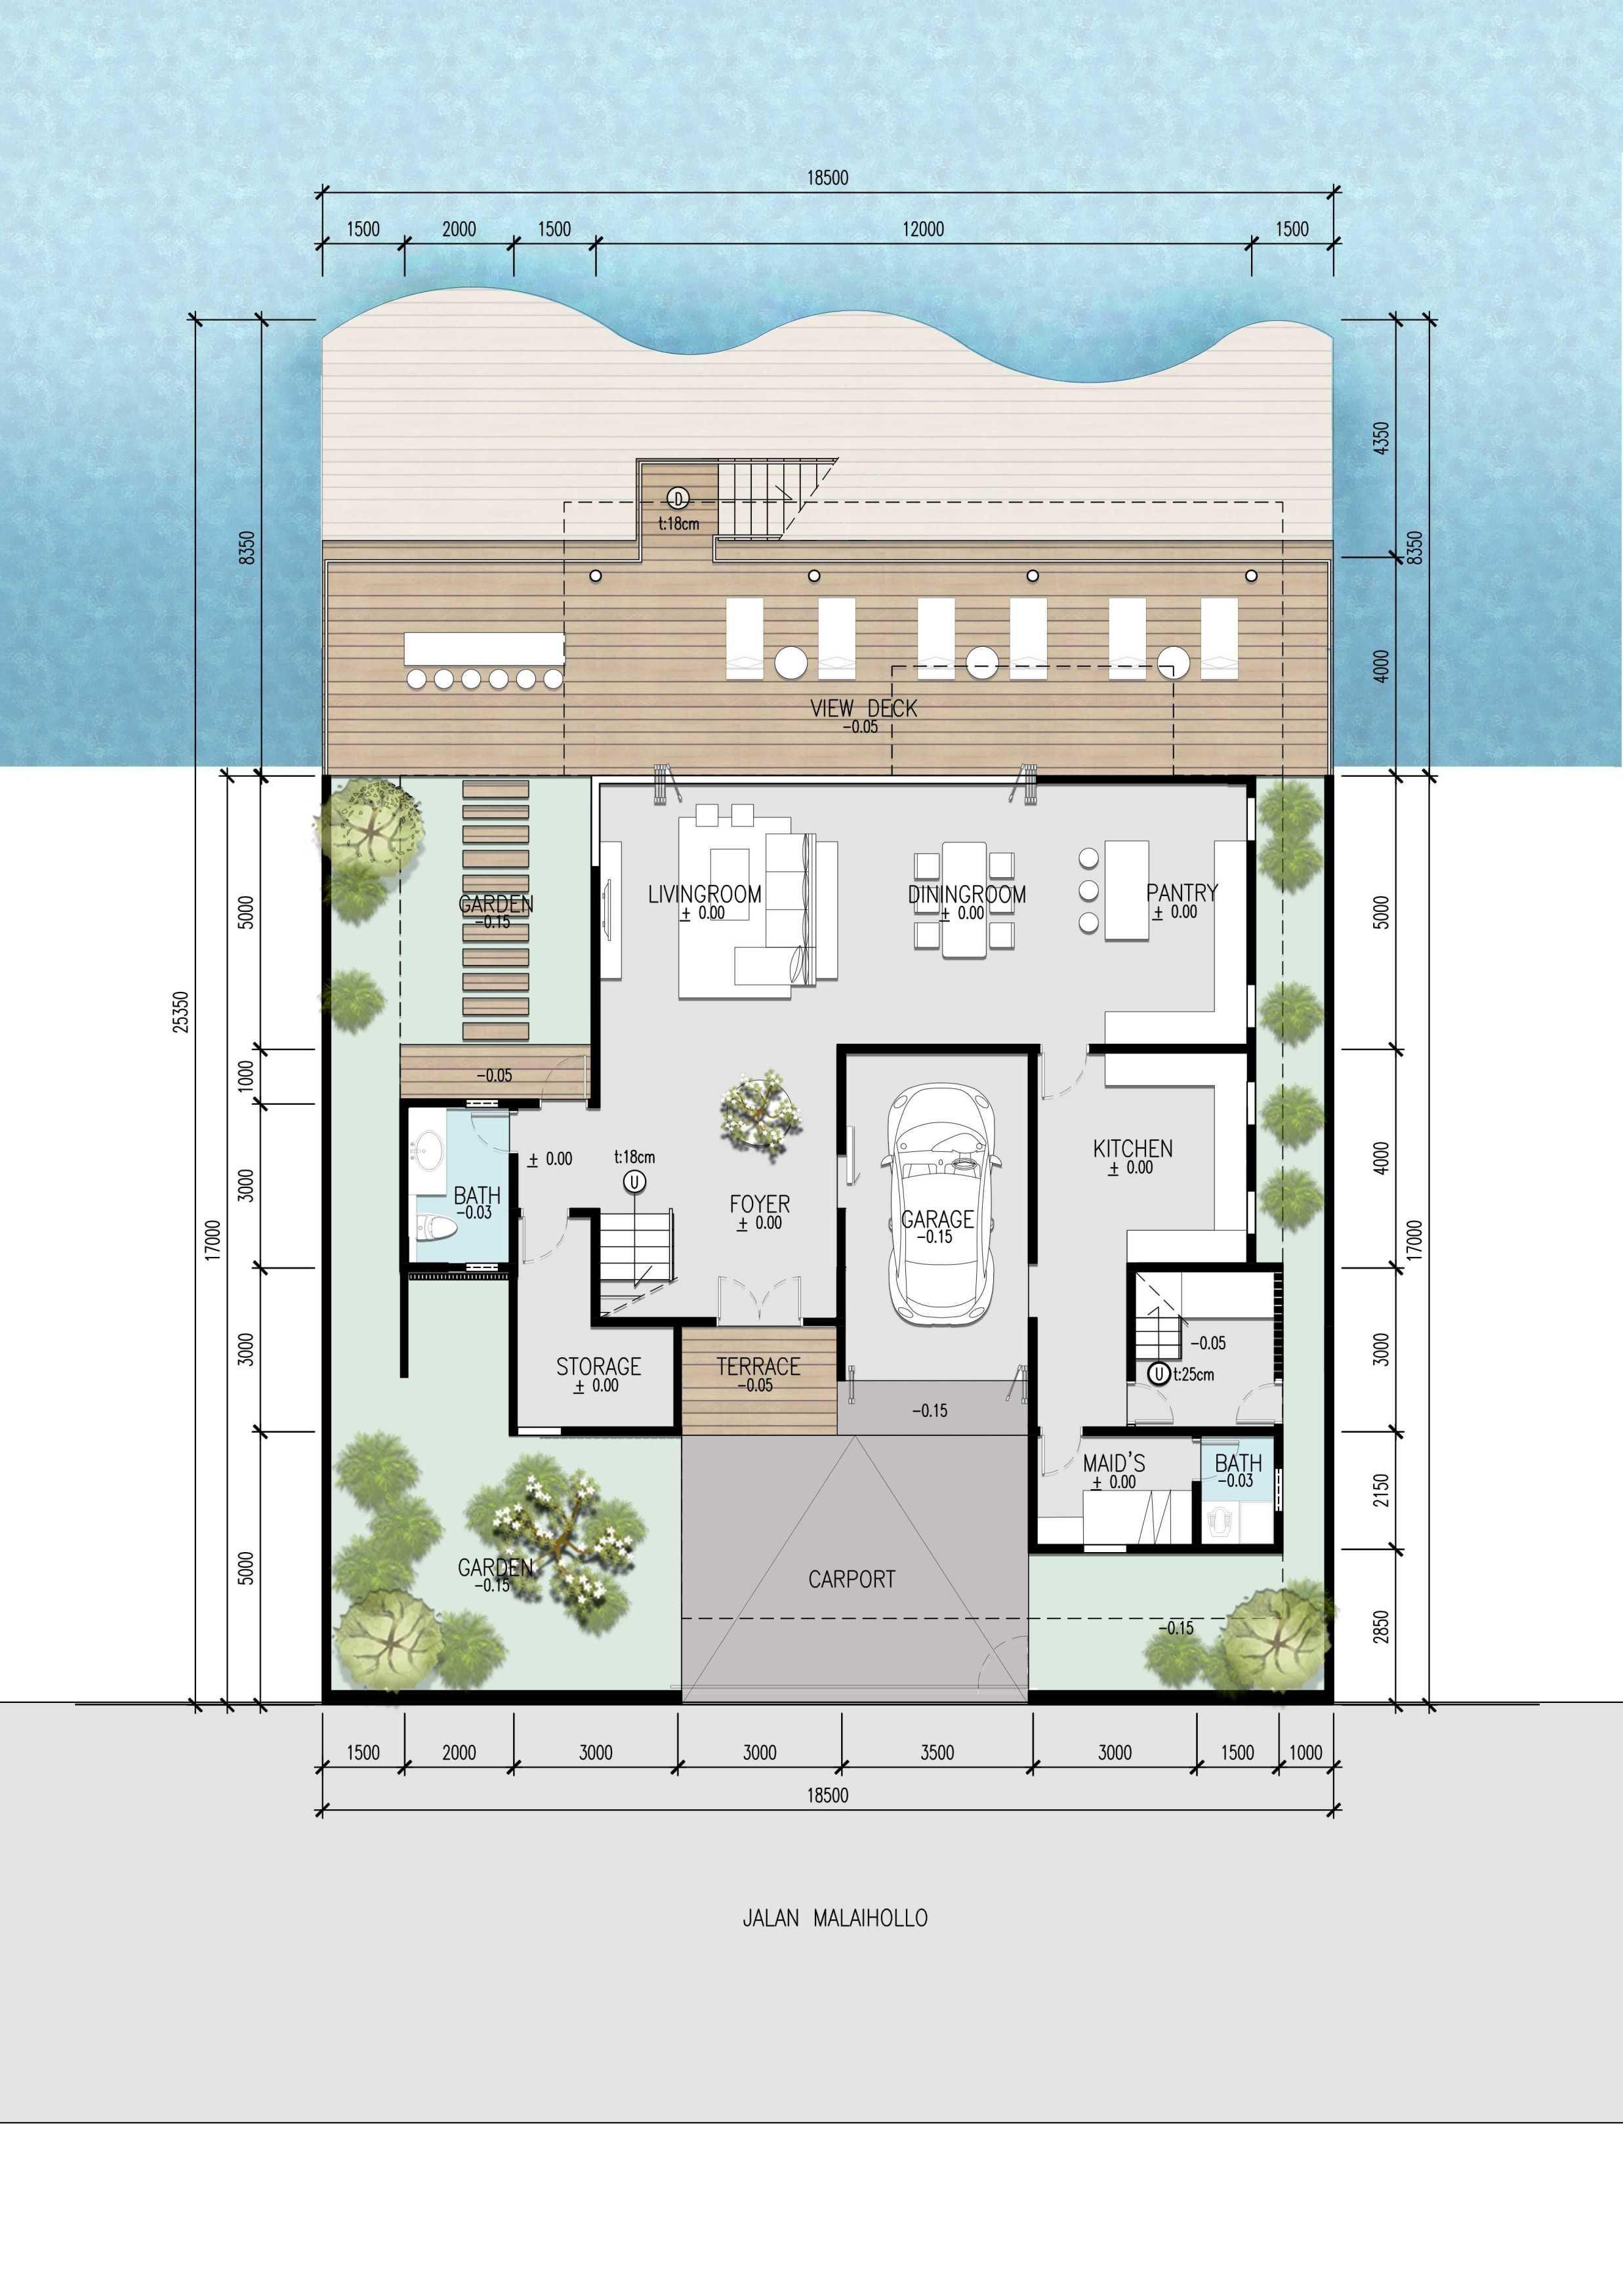 Baskara Design And Planning Malaiholo Residence Pulau Ambon, Maluku, Indonesia Pulau Ambon, Maluku, Indonesia Baskara-Design-And-Planning-Malaiholo-Residence   67073